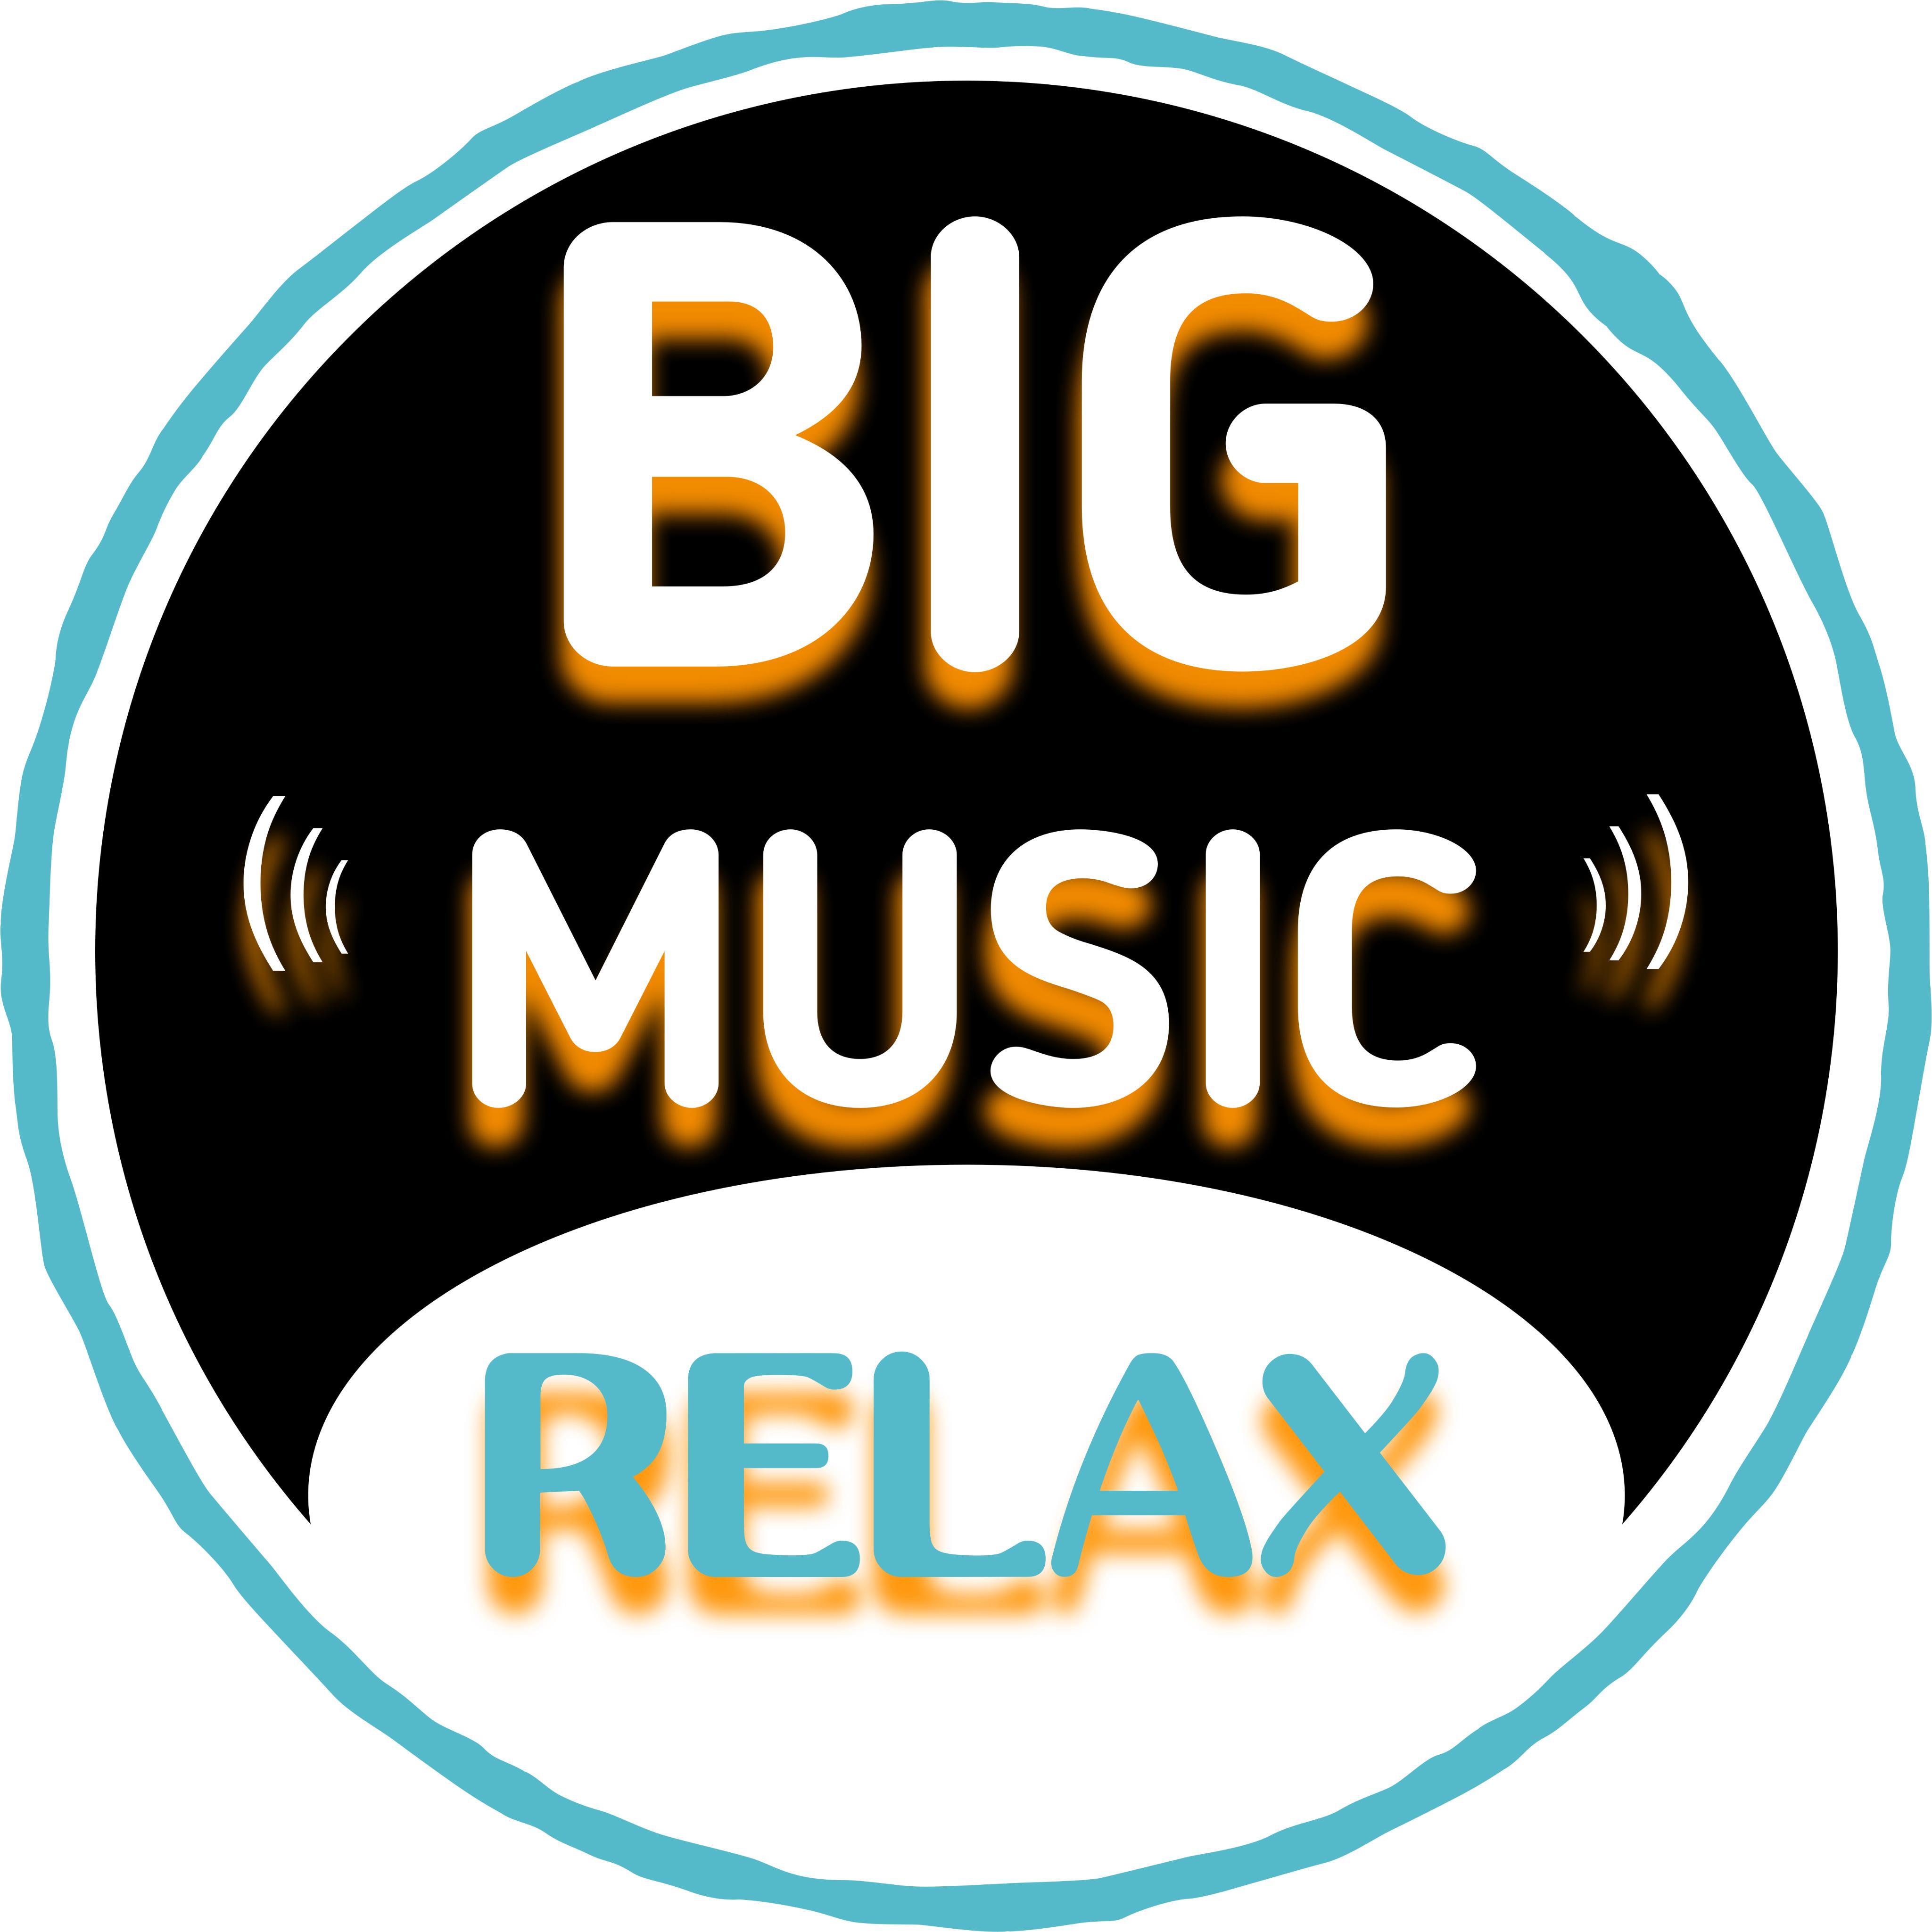 BIG Music Relax